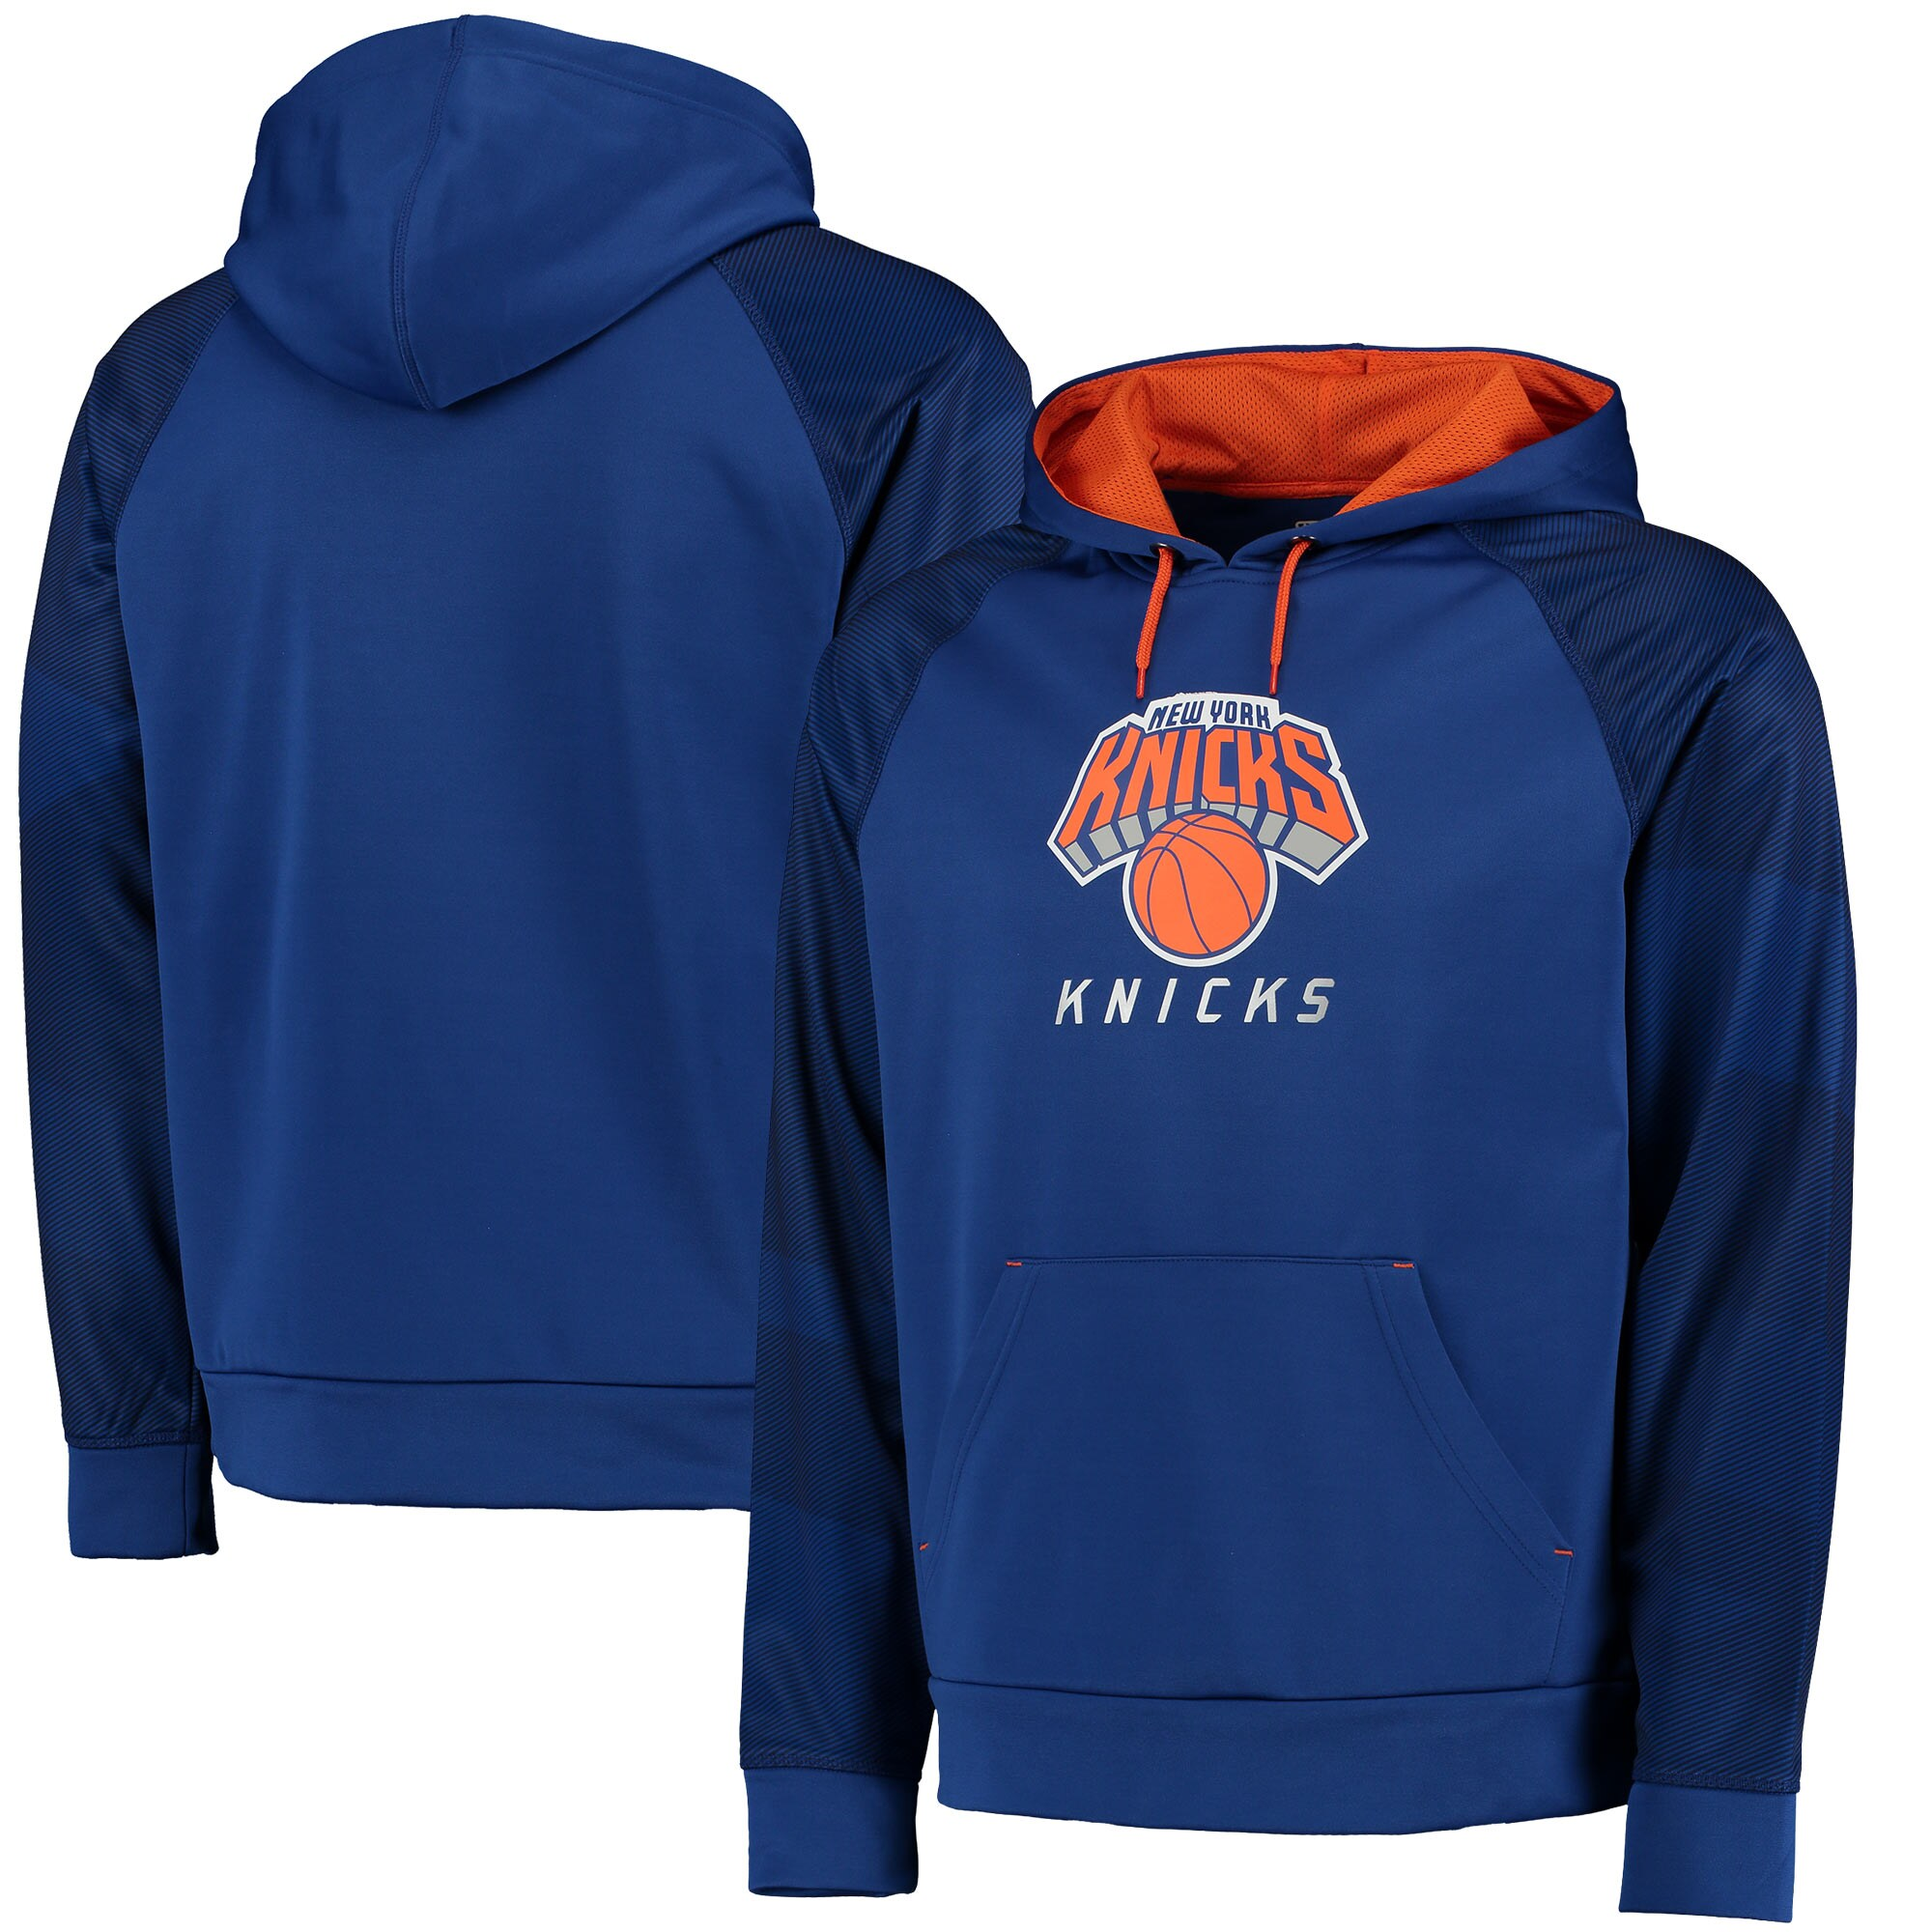 New York Knicks Majestic Armor II Therma Base Raglan Pullover Hoodie - Royal